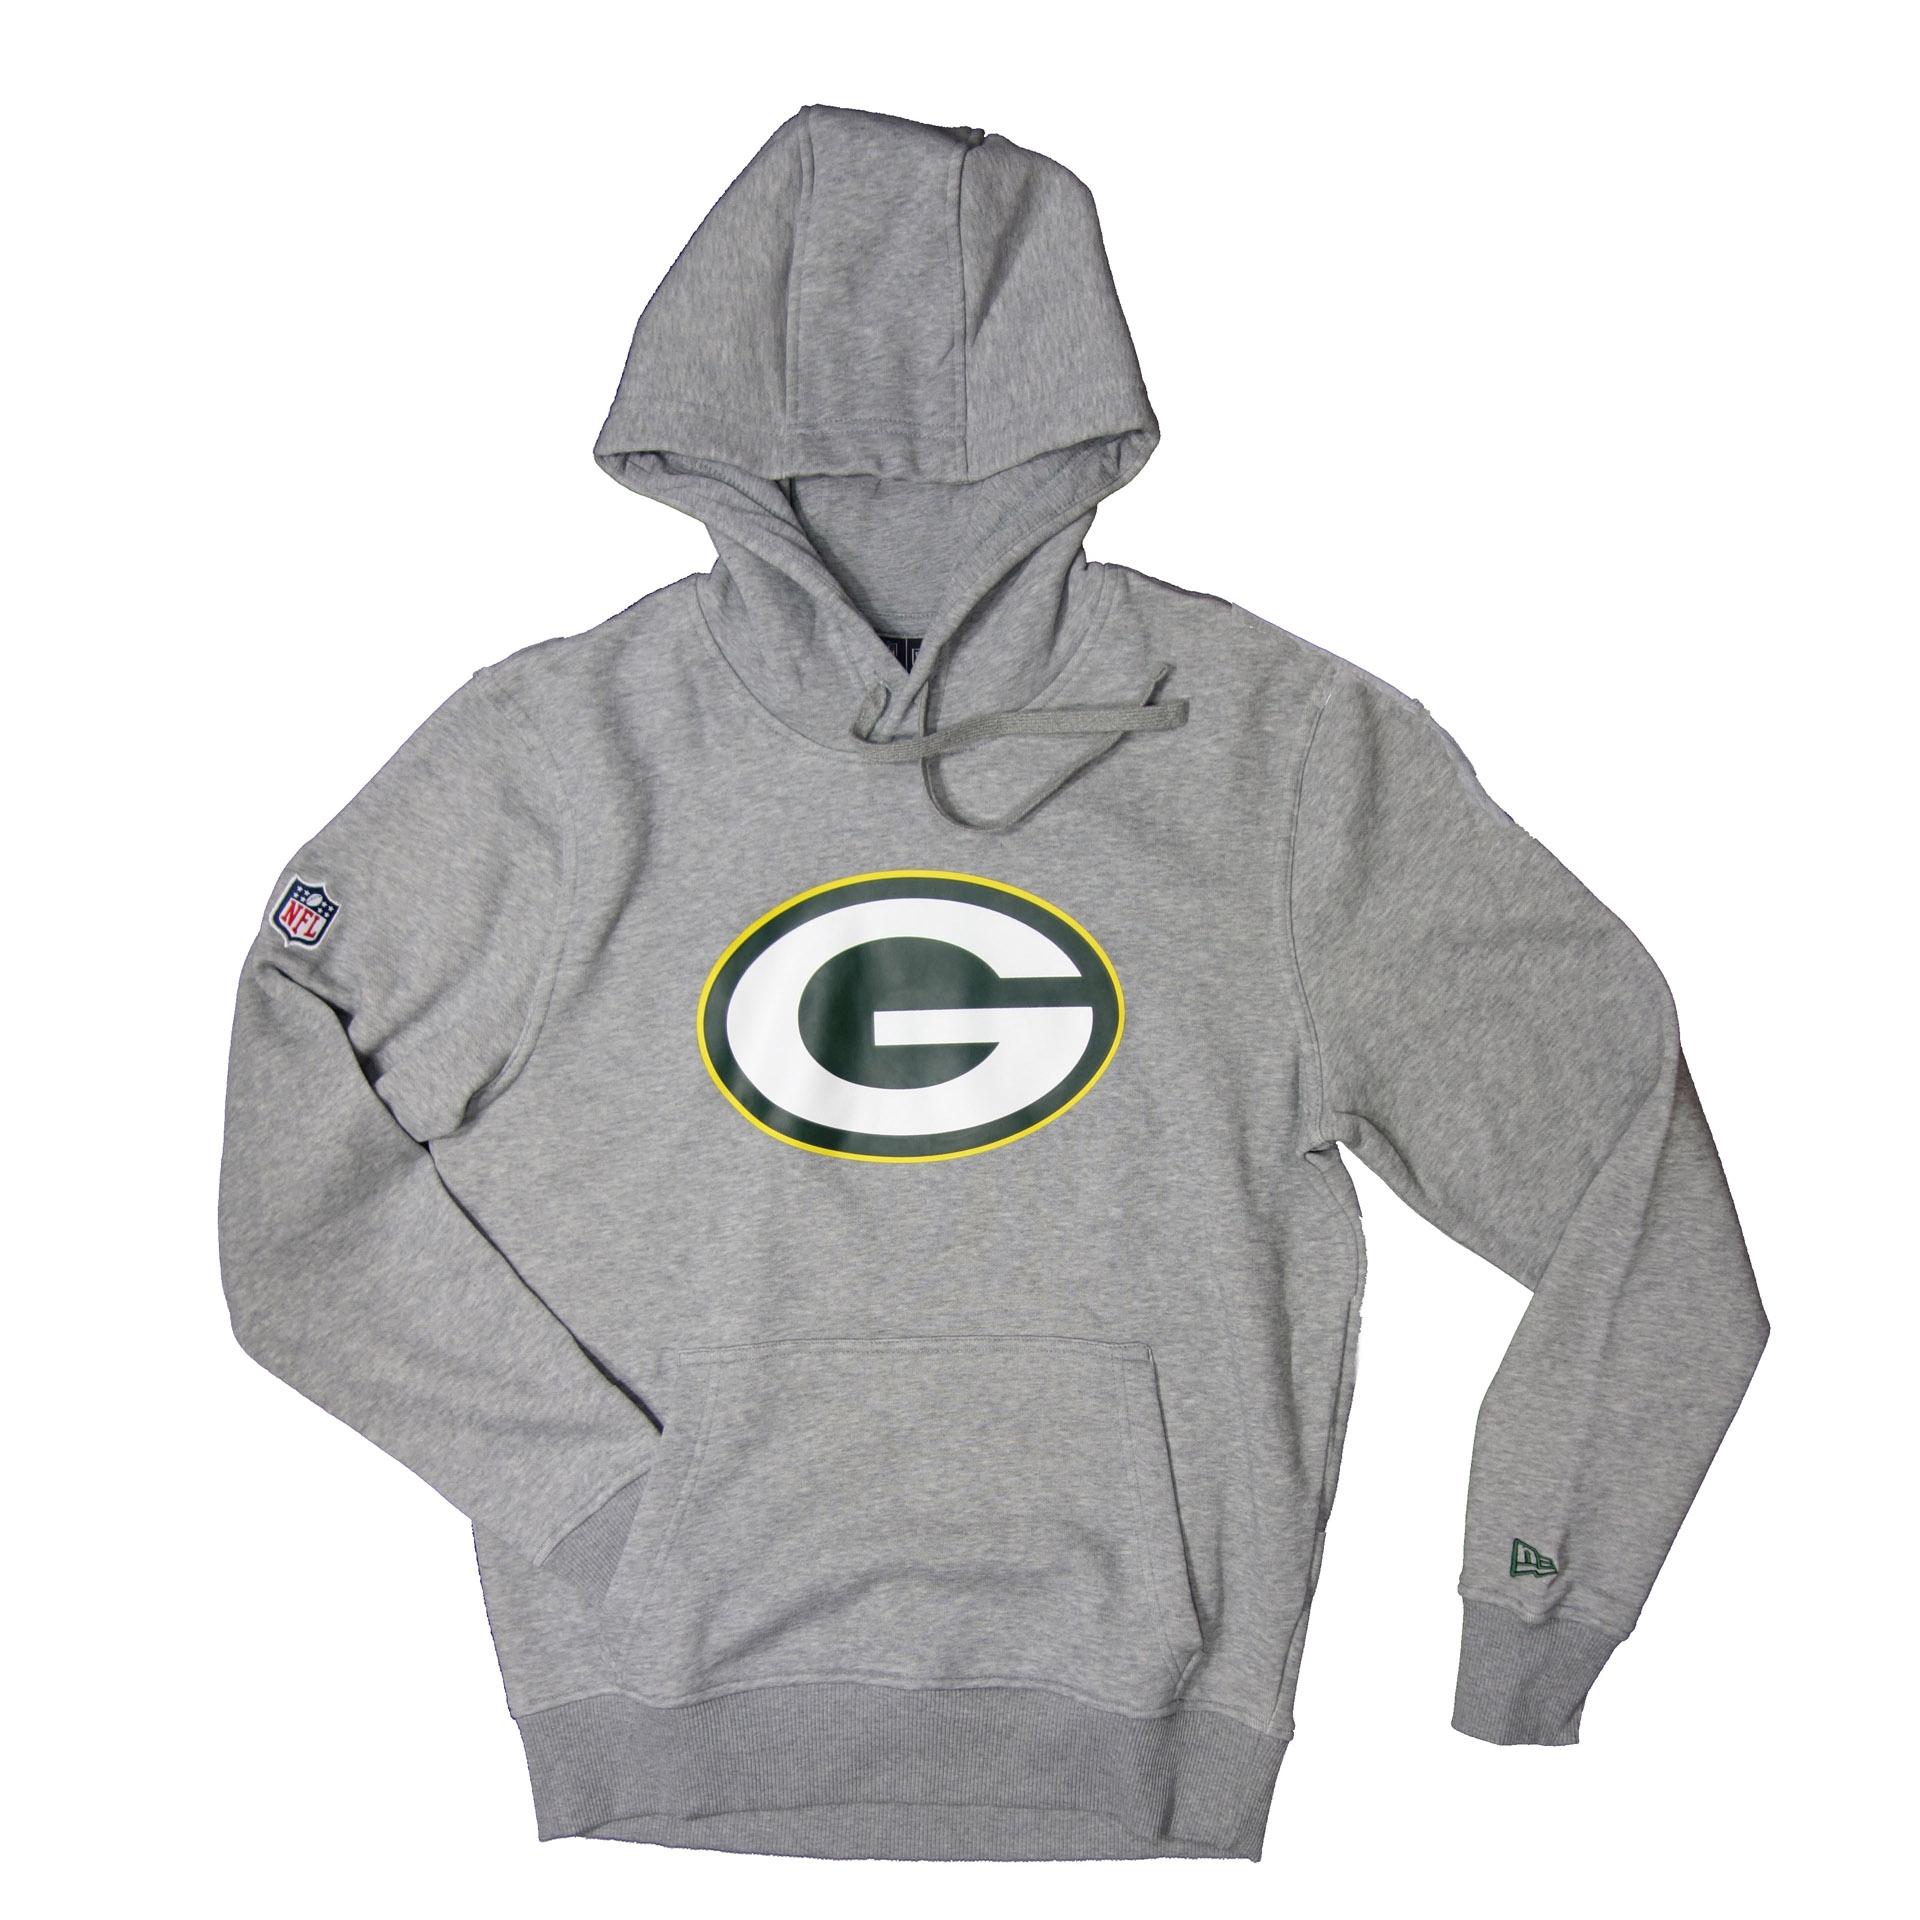 NFL New Era Hoodie Green Bay Packers